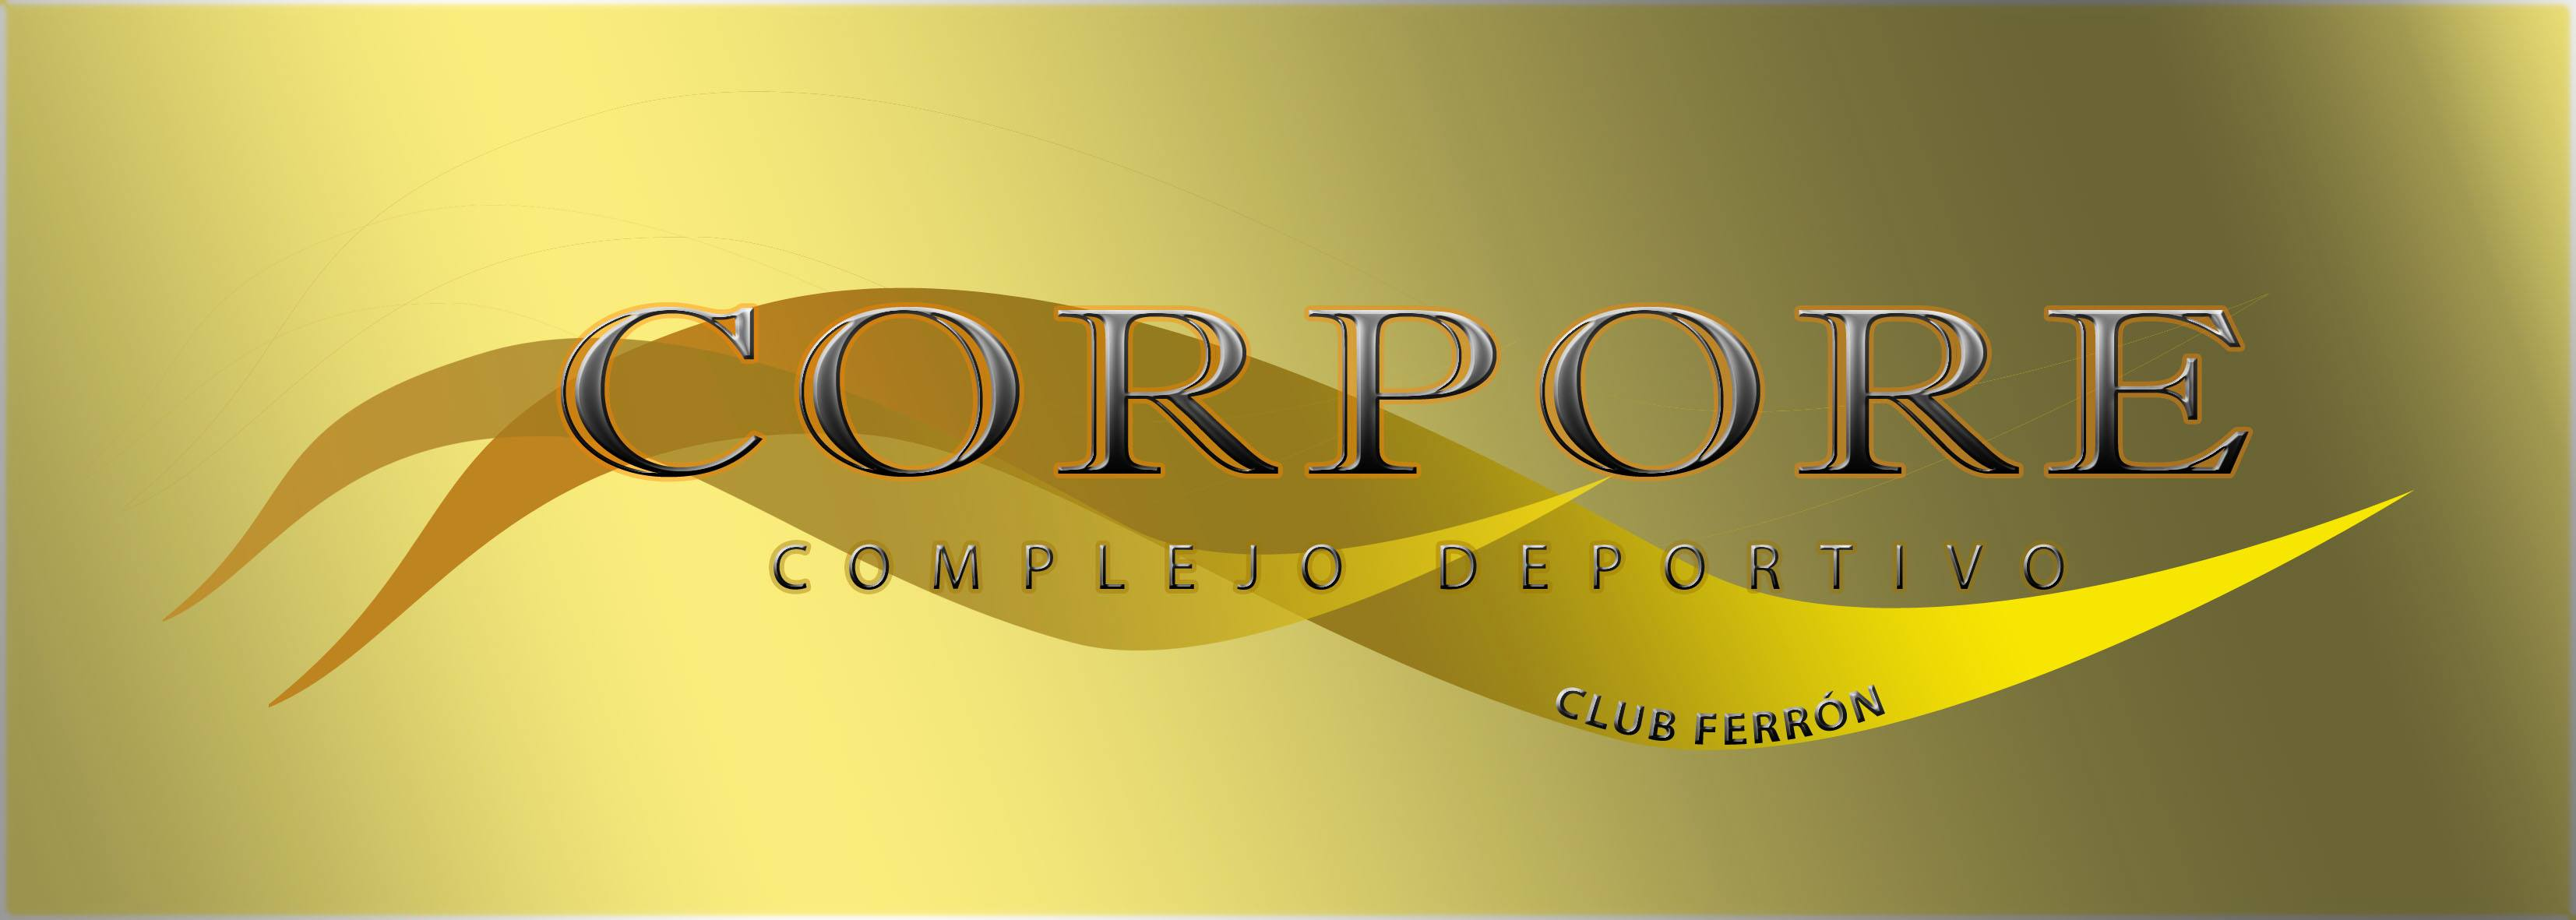 Club Ferrón - Complejo Deportivo